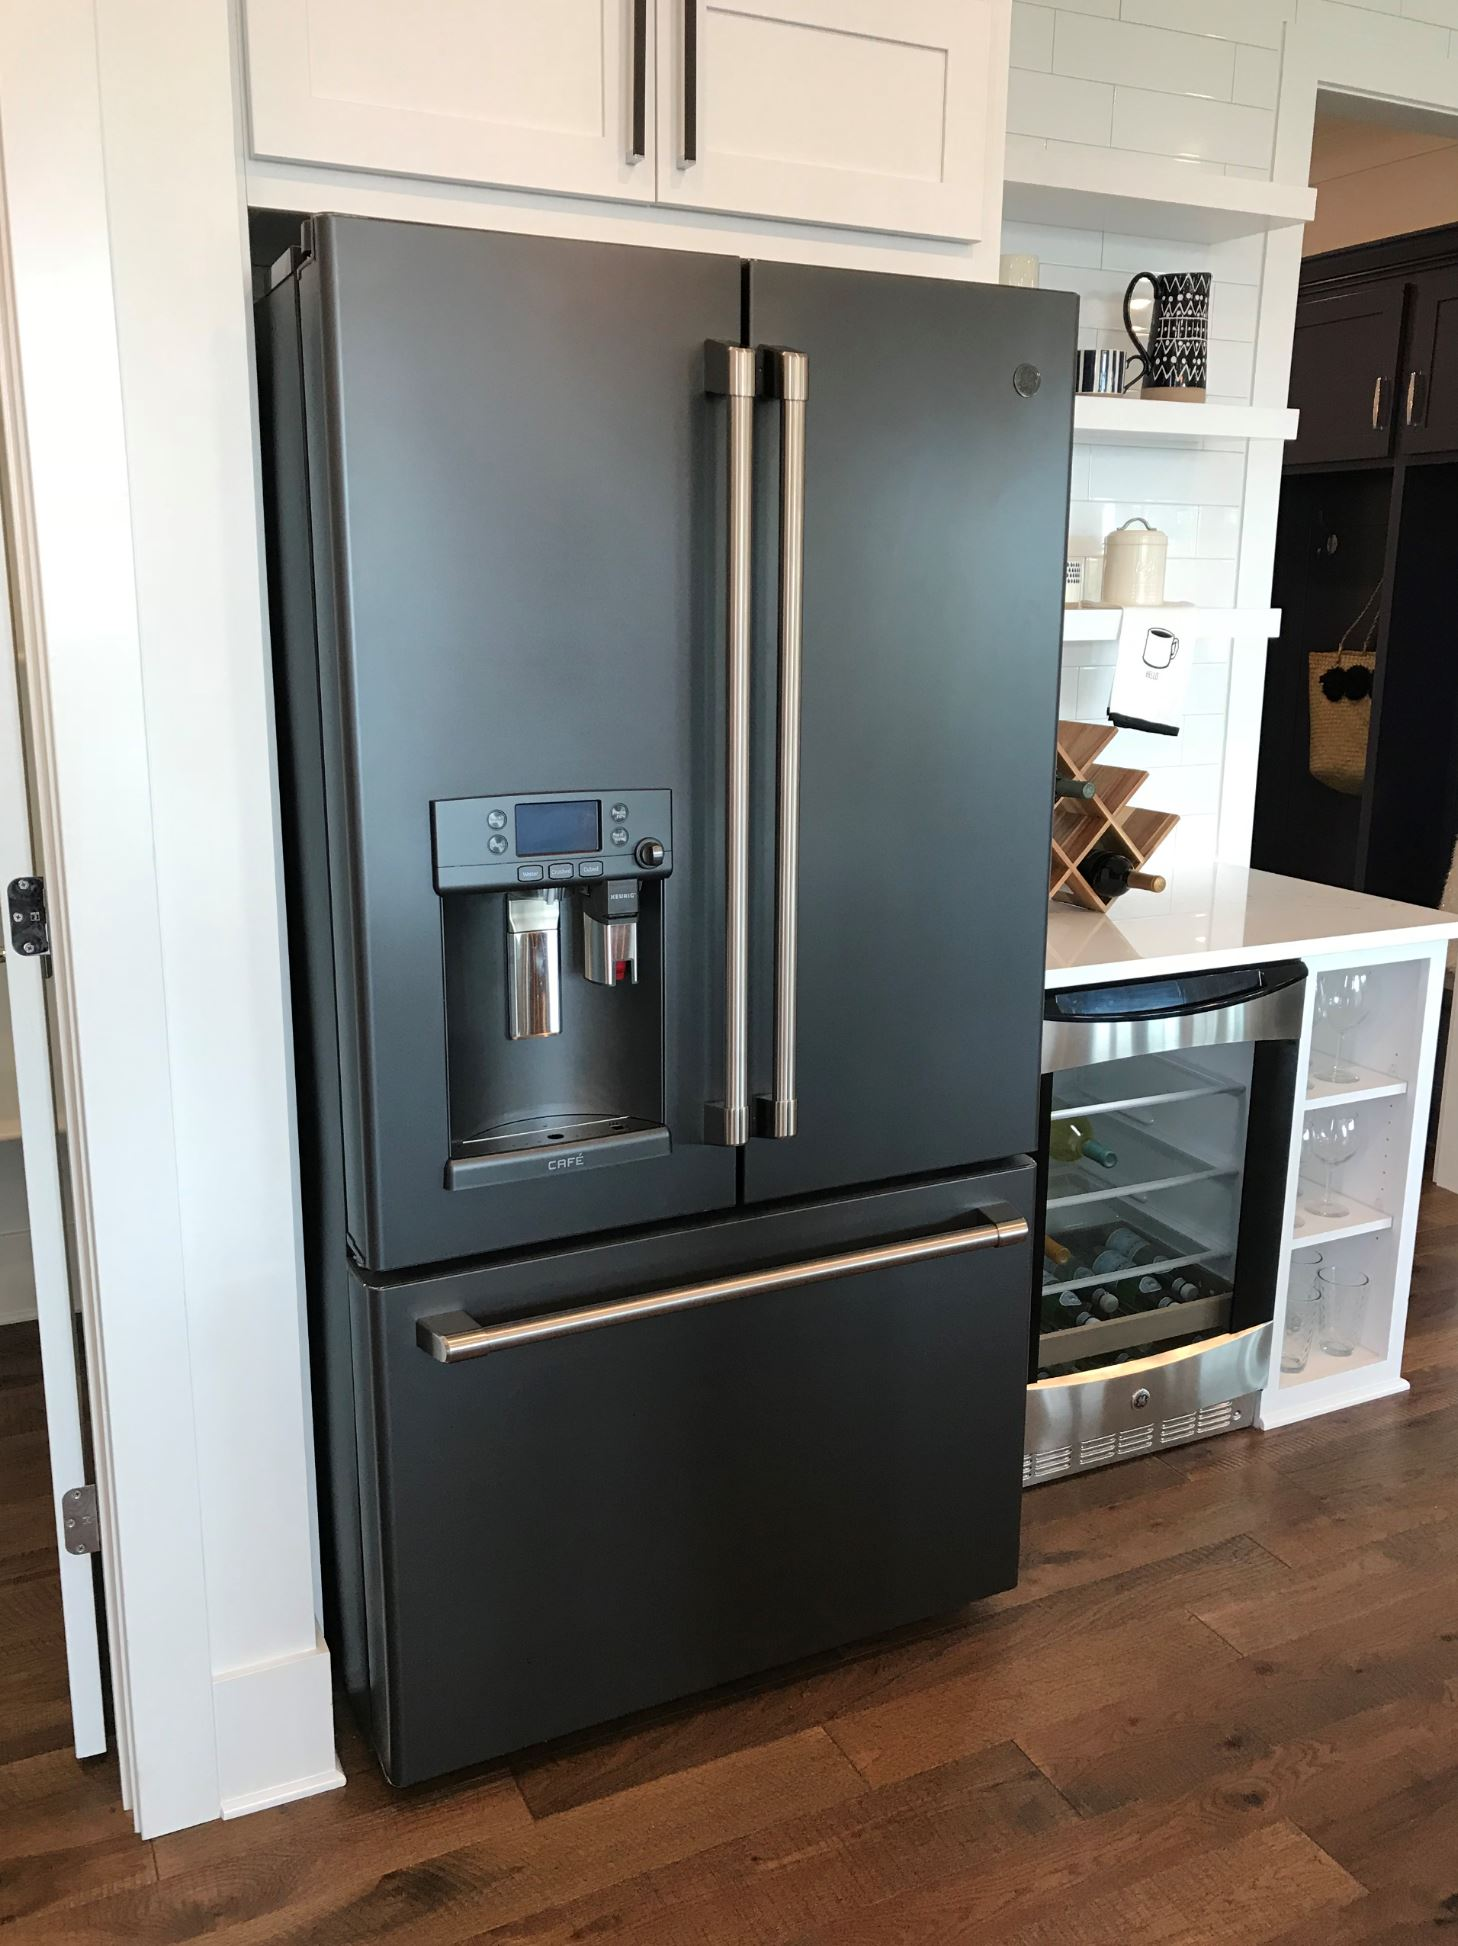 4 appliance trends slate refrigerator.JPG